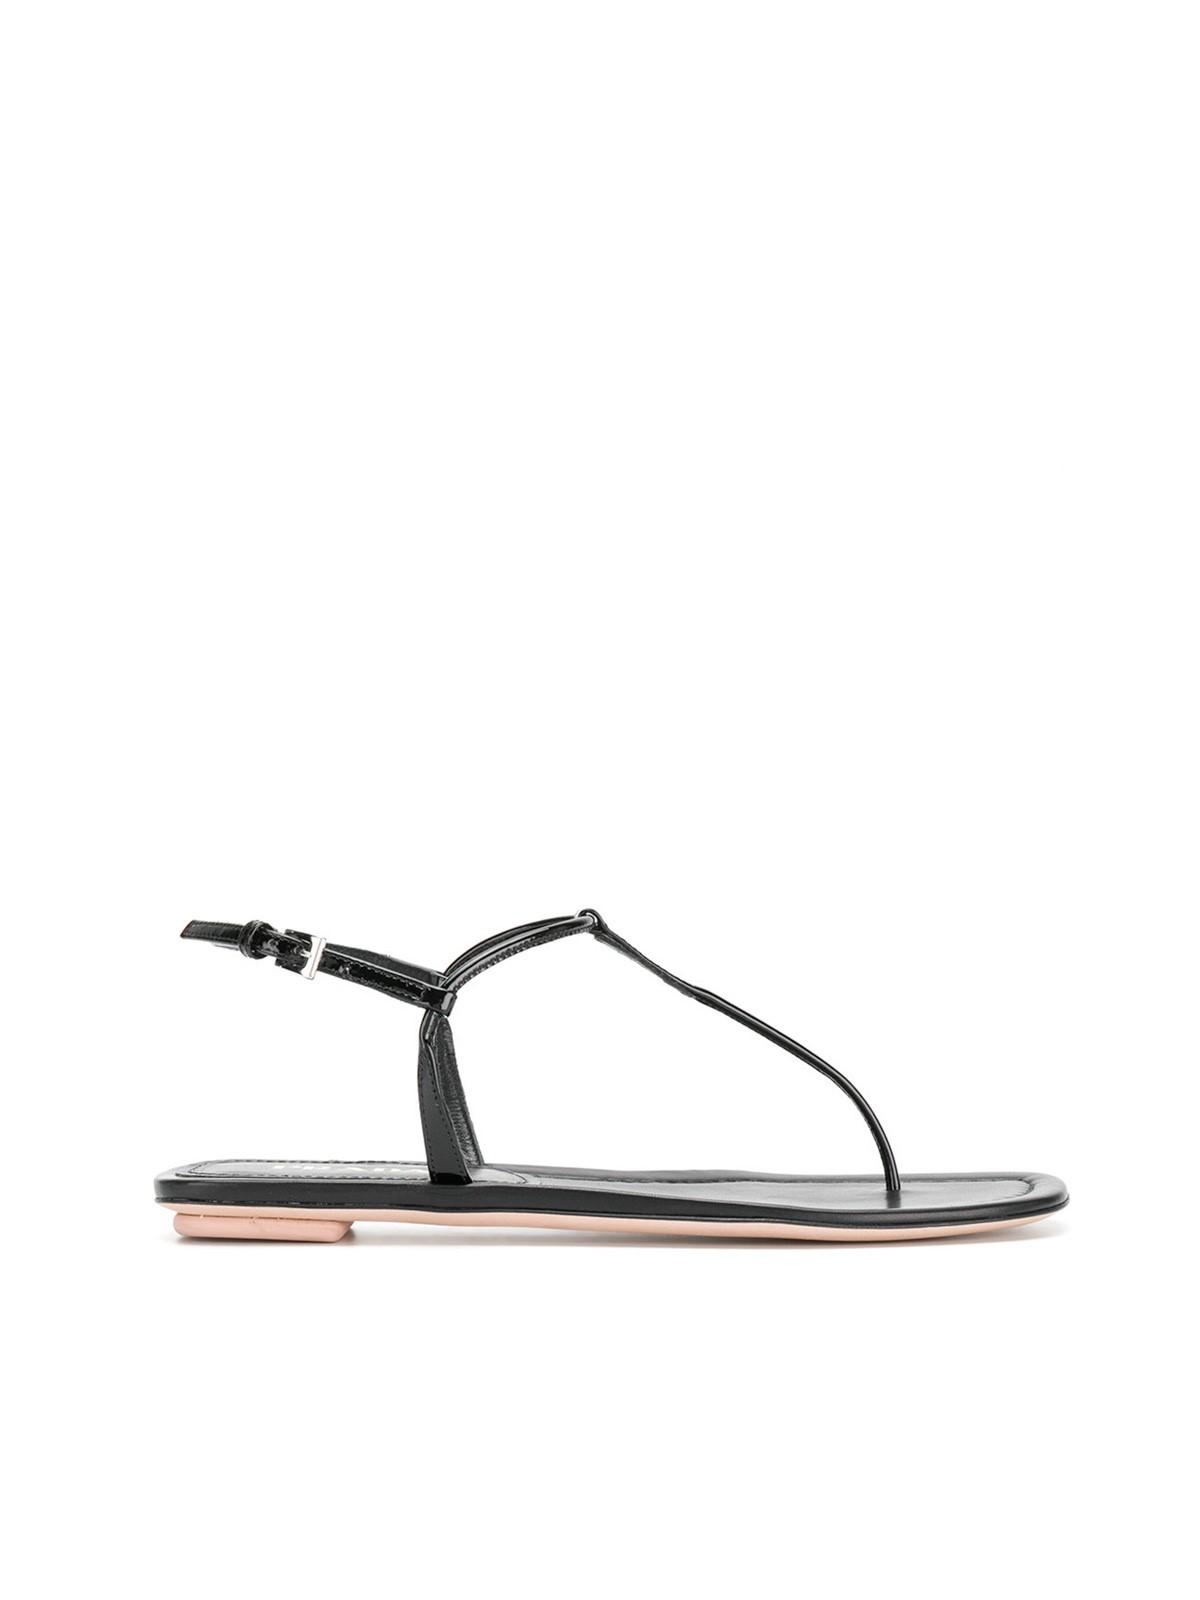 Prada T-bar sandals outlet best place new cheap online deals for sale 3P2nx